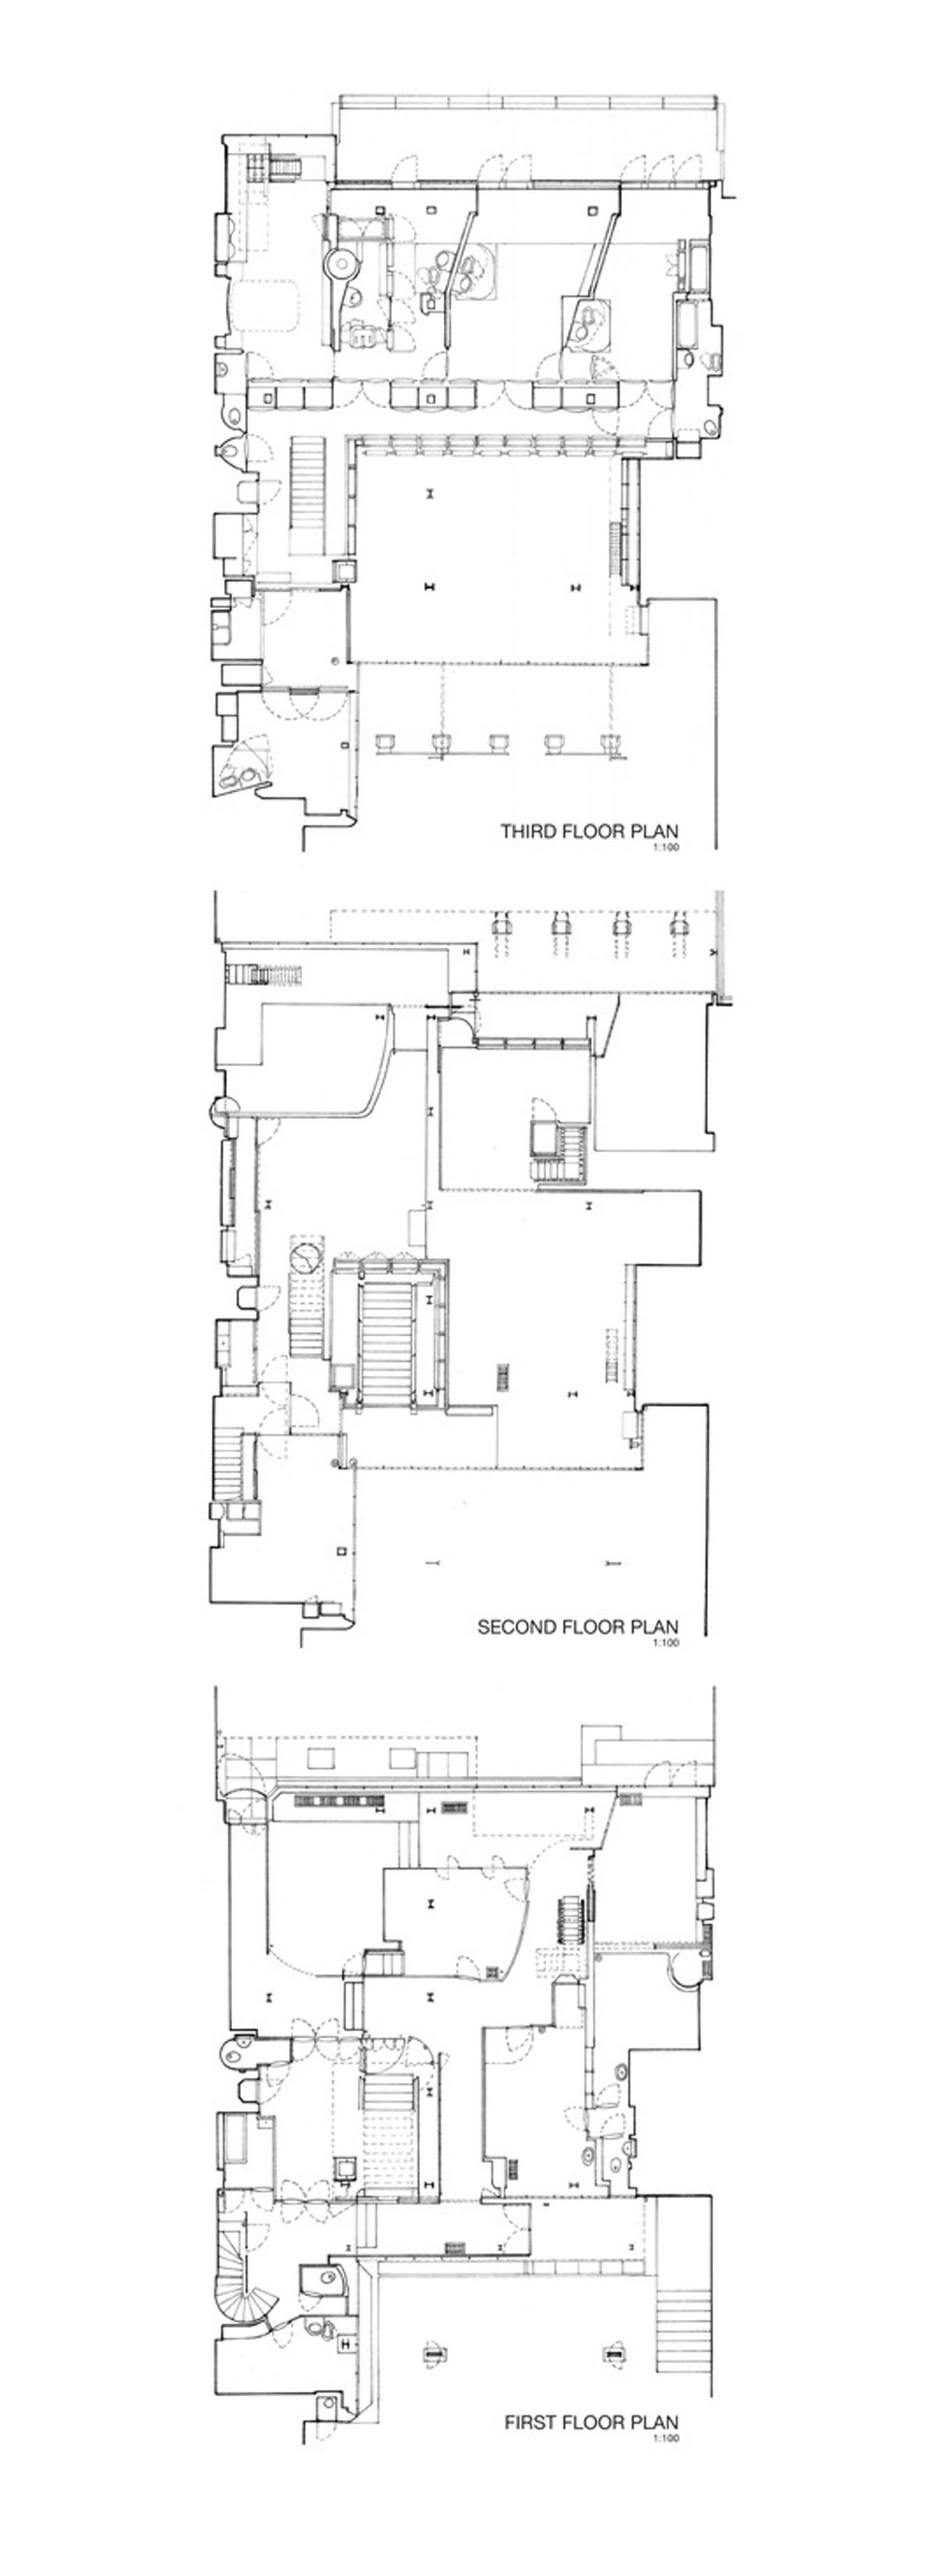 image on archisquare architettura design blog http www image on archisquare architettura design blog http www archisquare it rafael moneo museo di arte romana merida spagna pinterest ptsd and